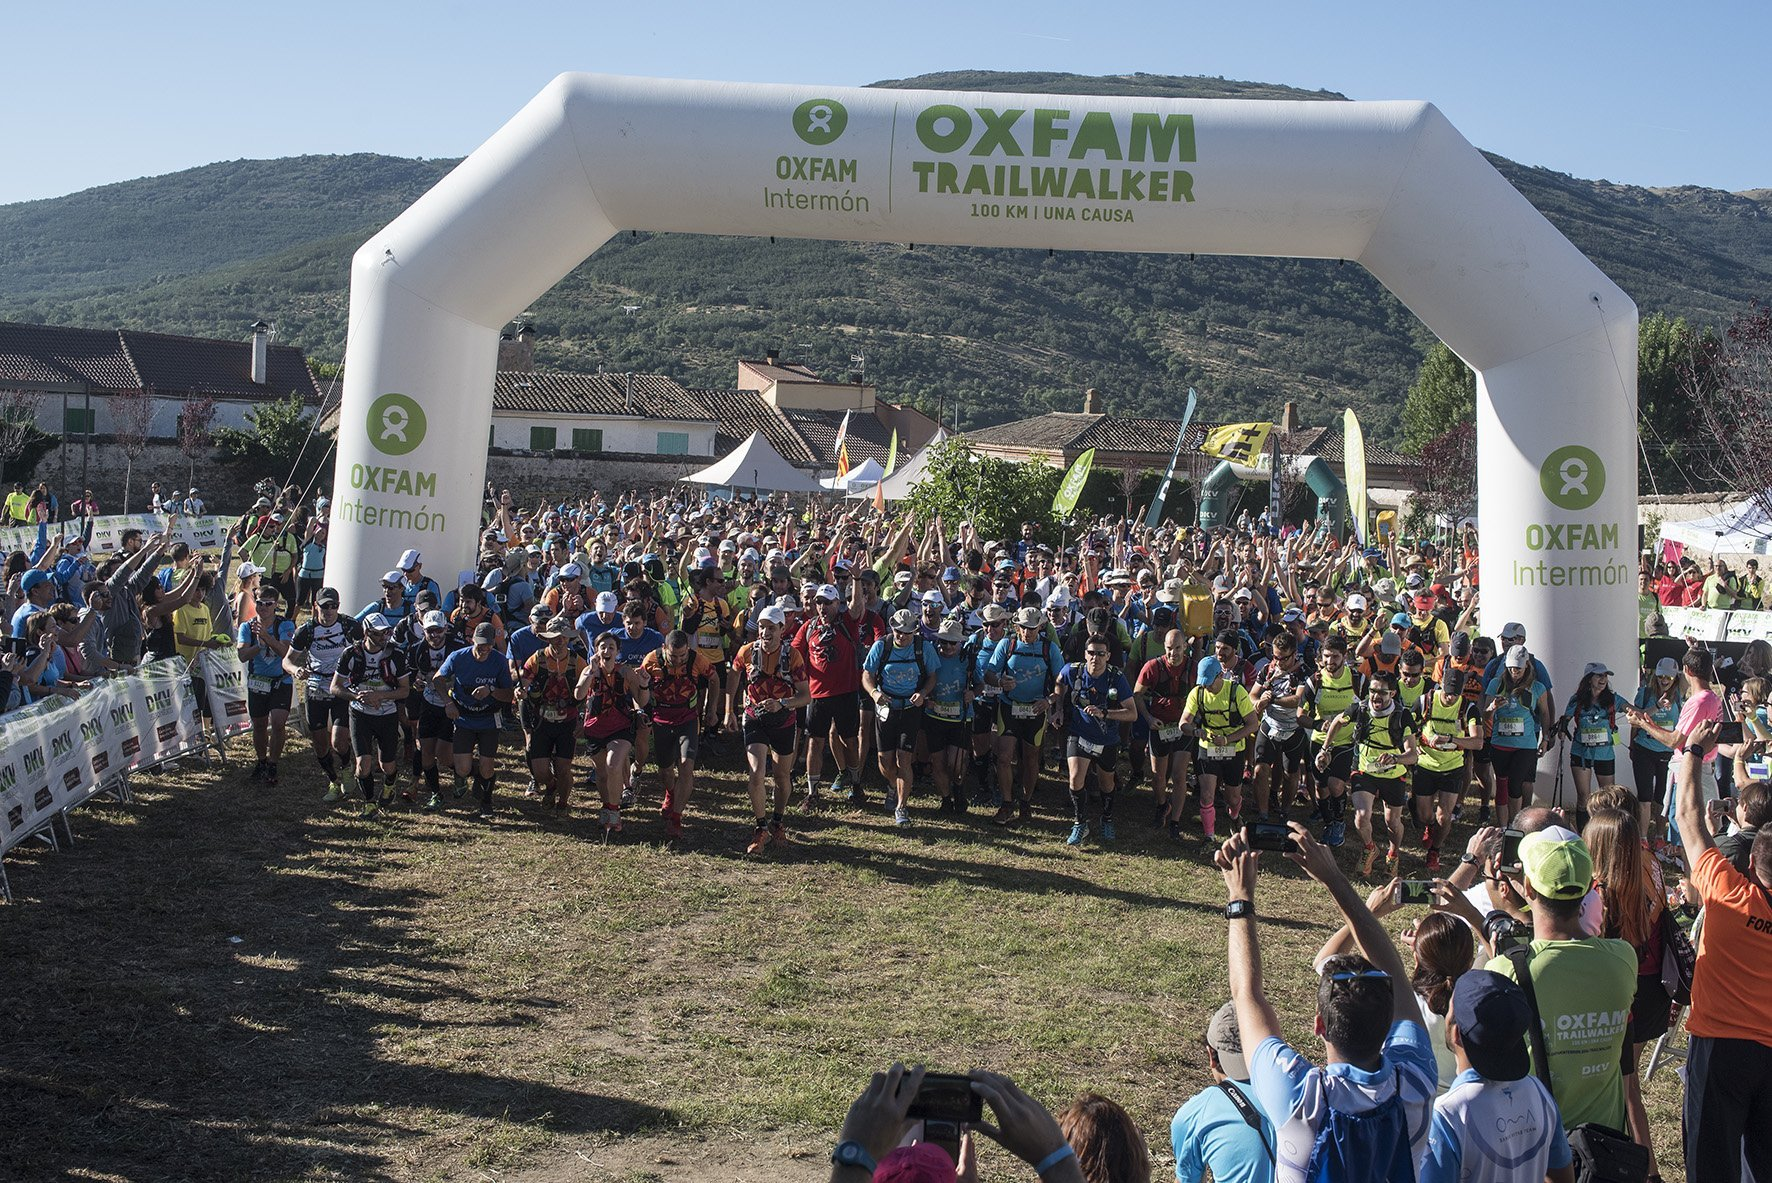 oxfam-trailwalker-madrid_2015-foto_-miguel-angel-munoz-romero_0001